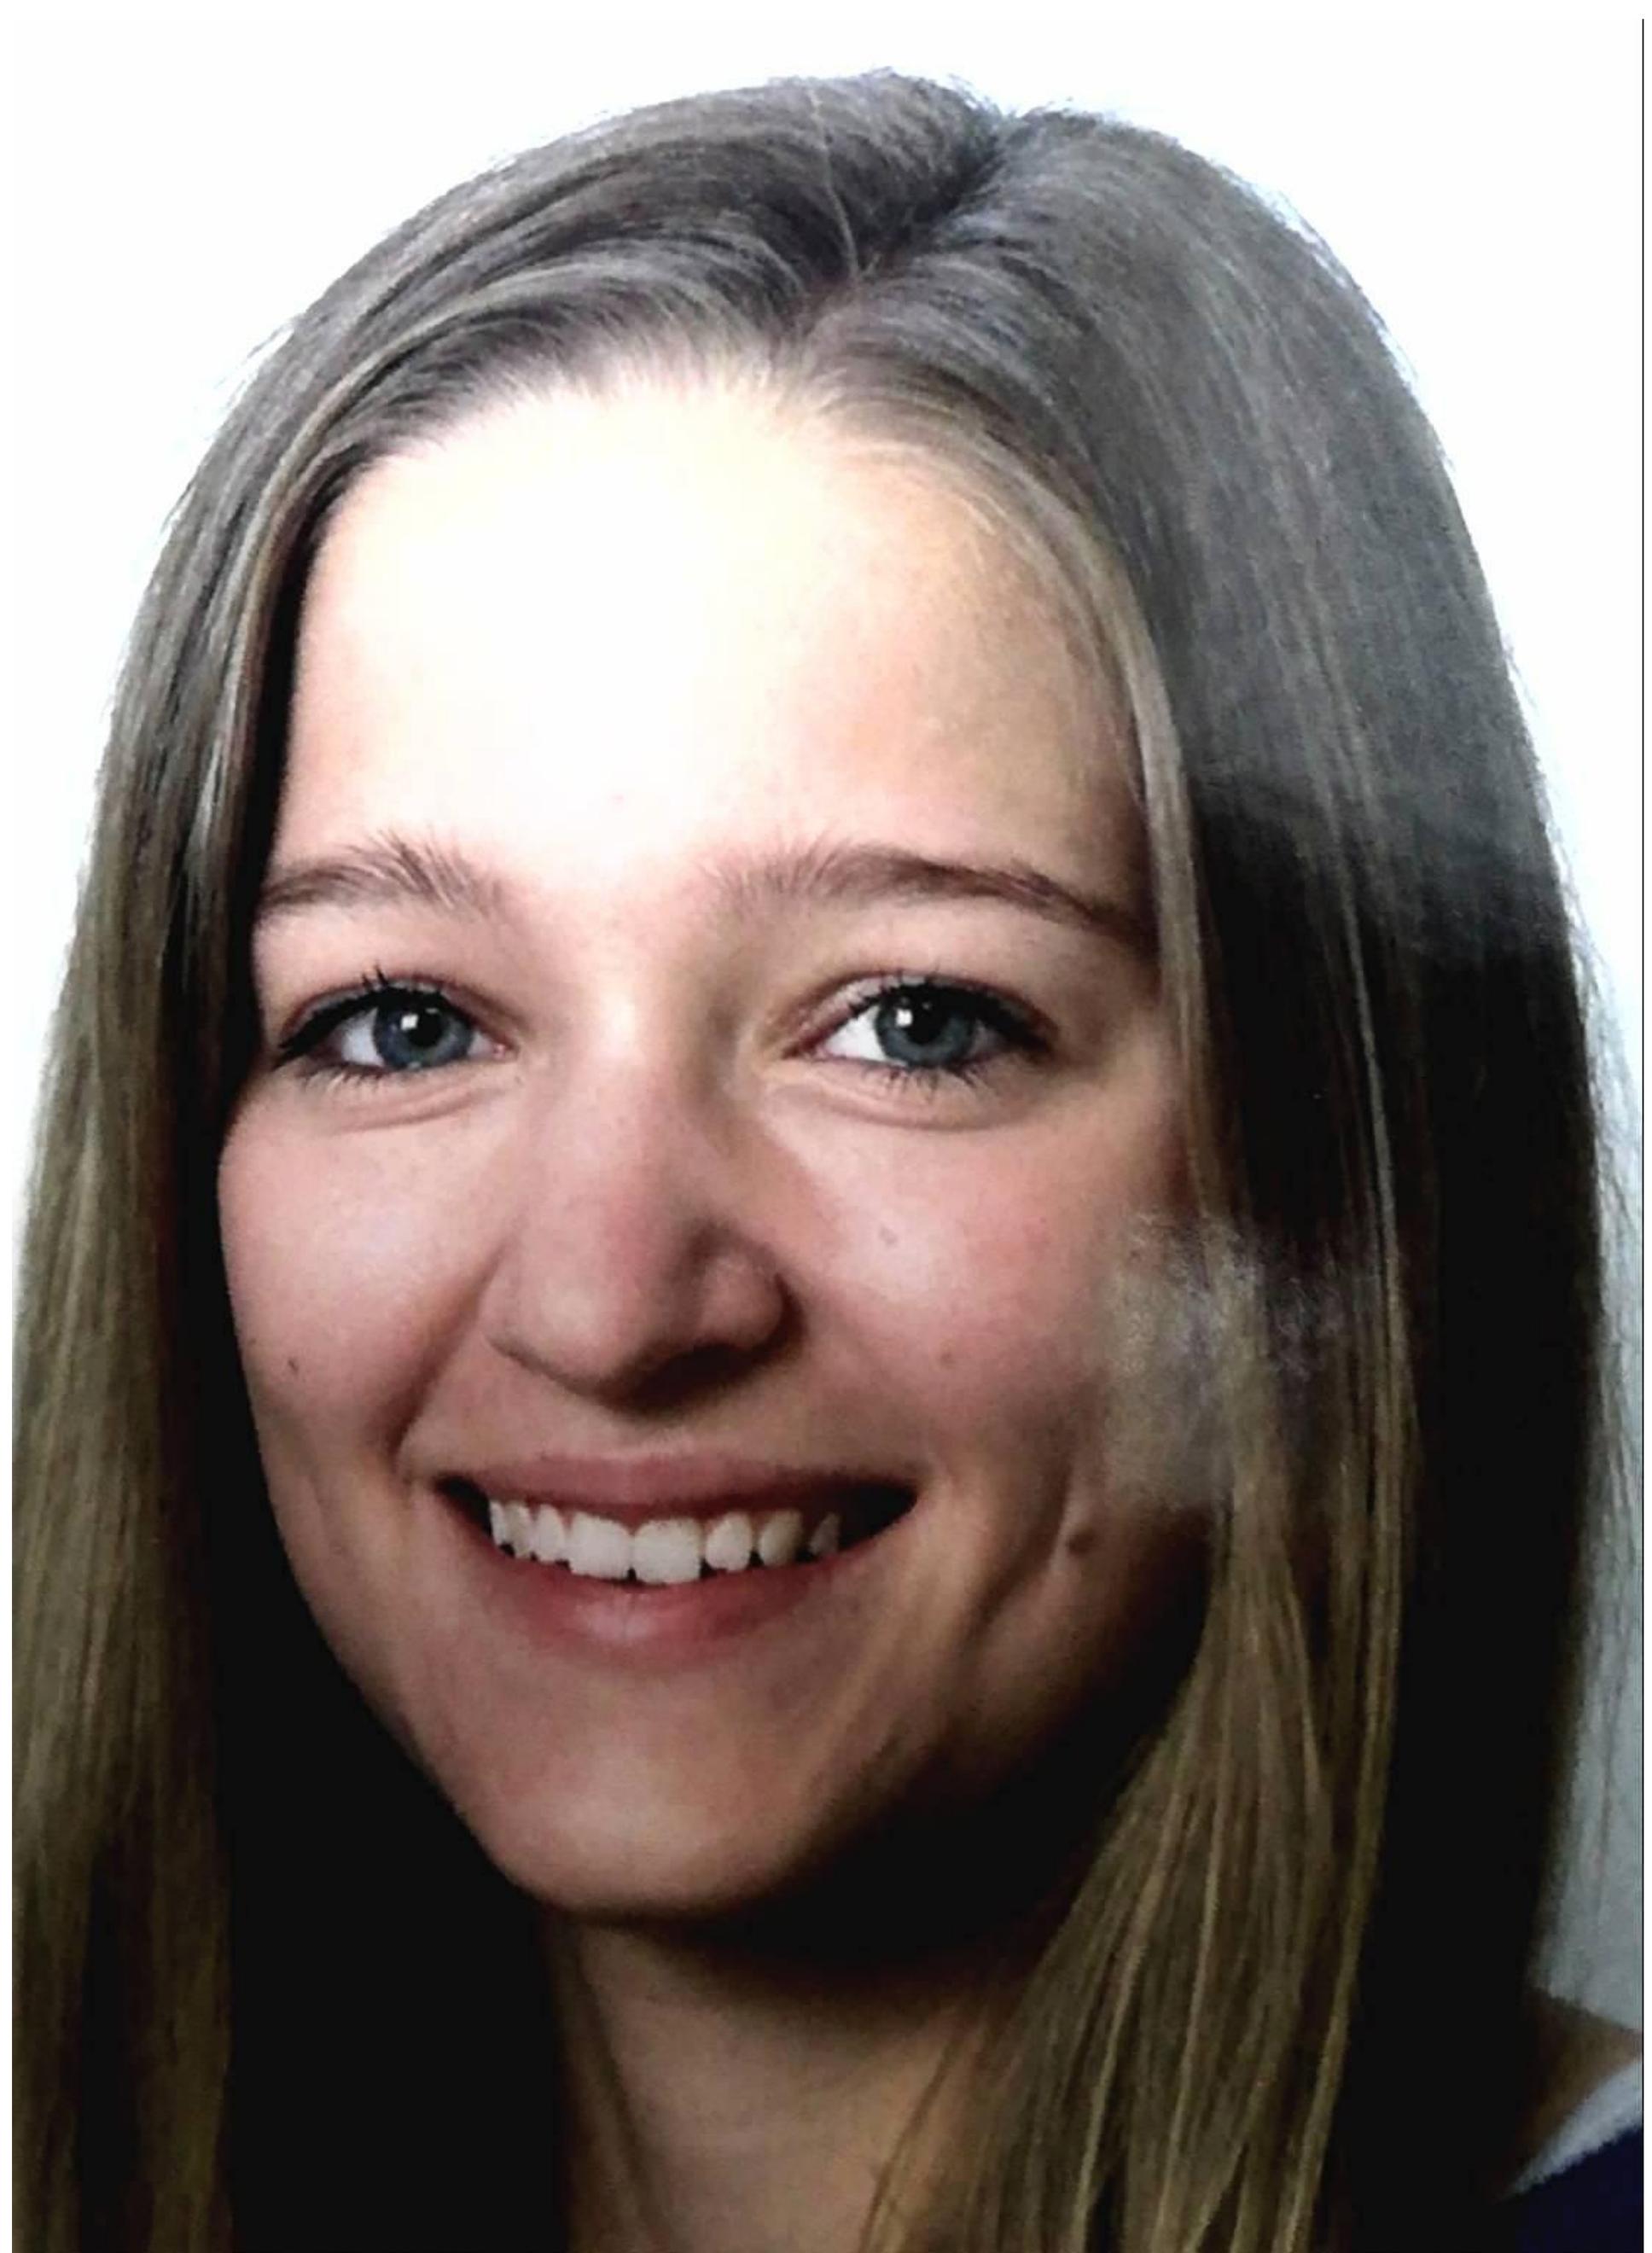 Theresa Straus